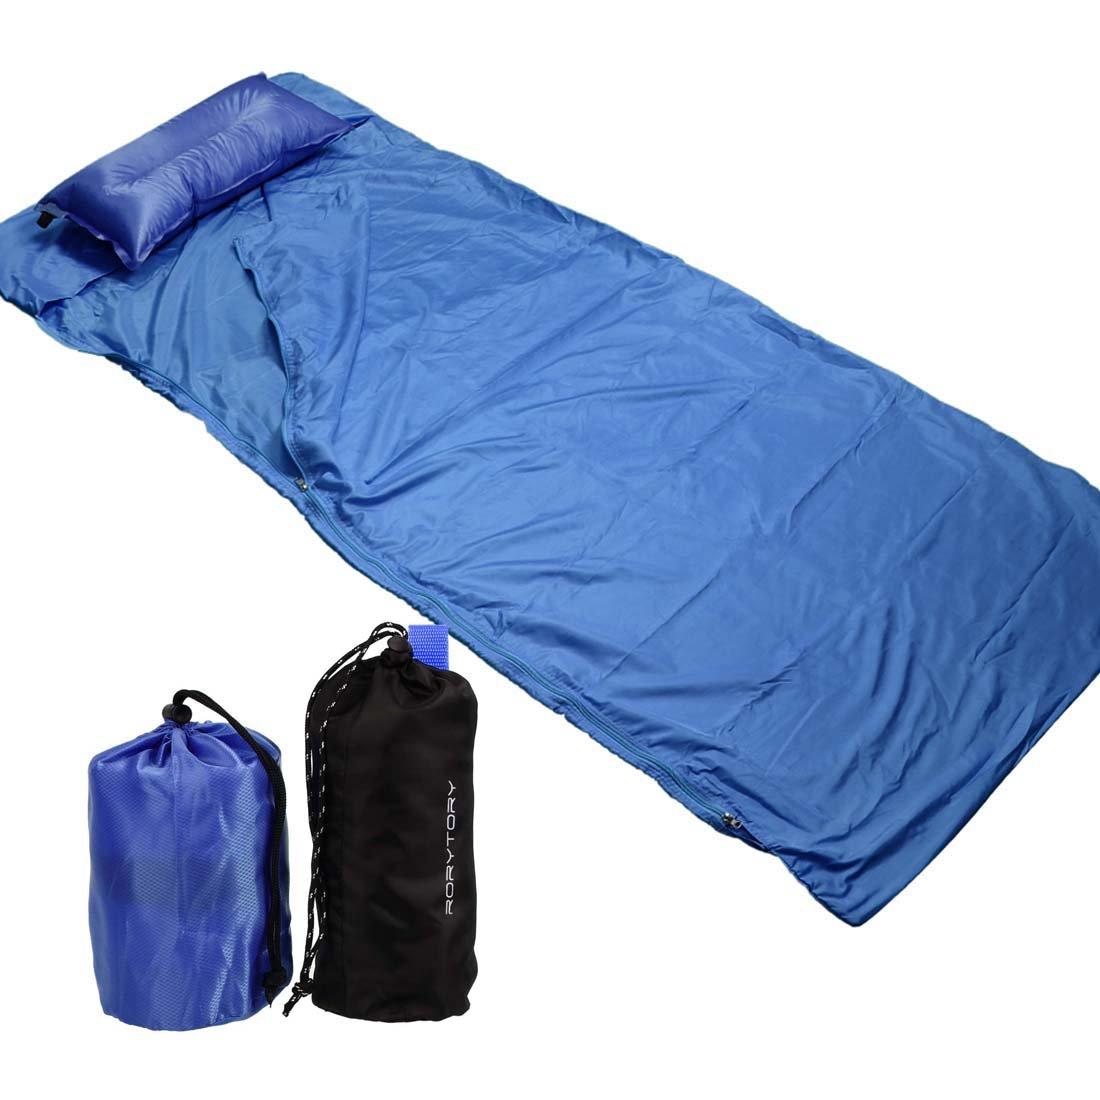 RoryTory 膨らませるキャンプ用枕 寝袋用ライナー付き セット 携帯用 B01N9RDEU8  ブルー